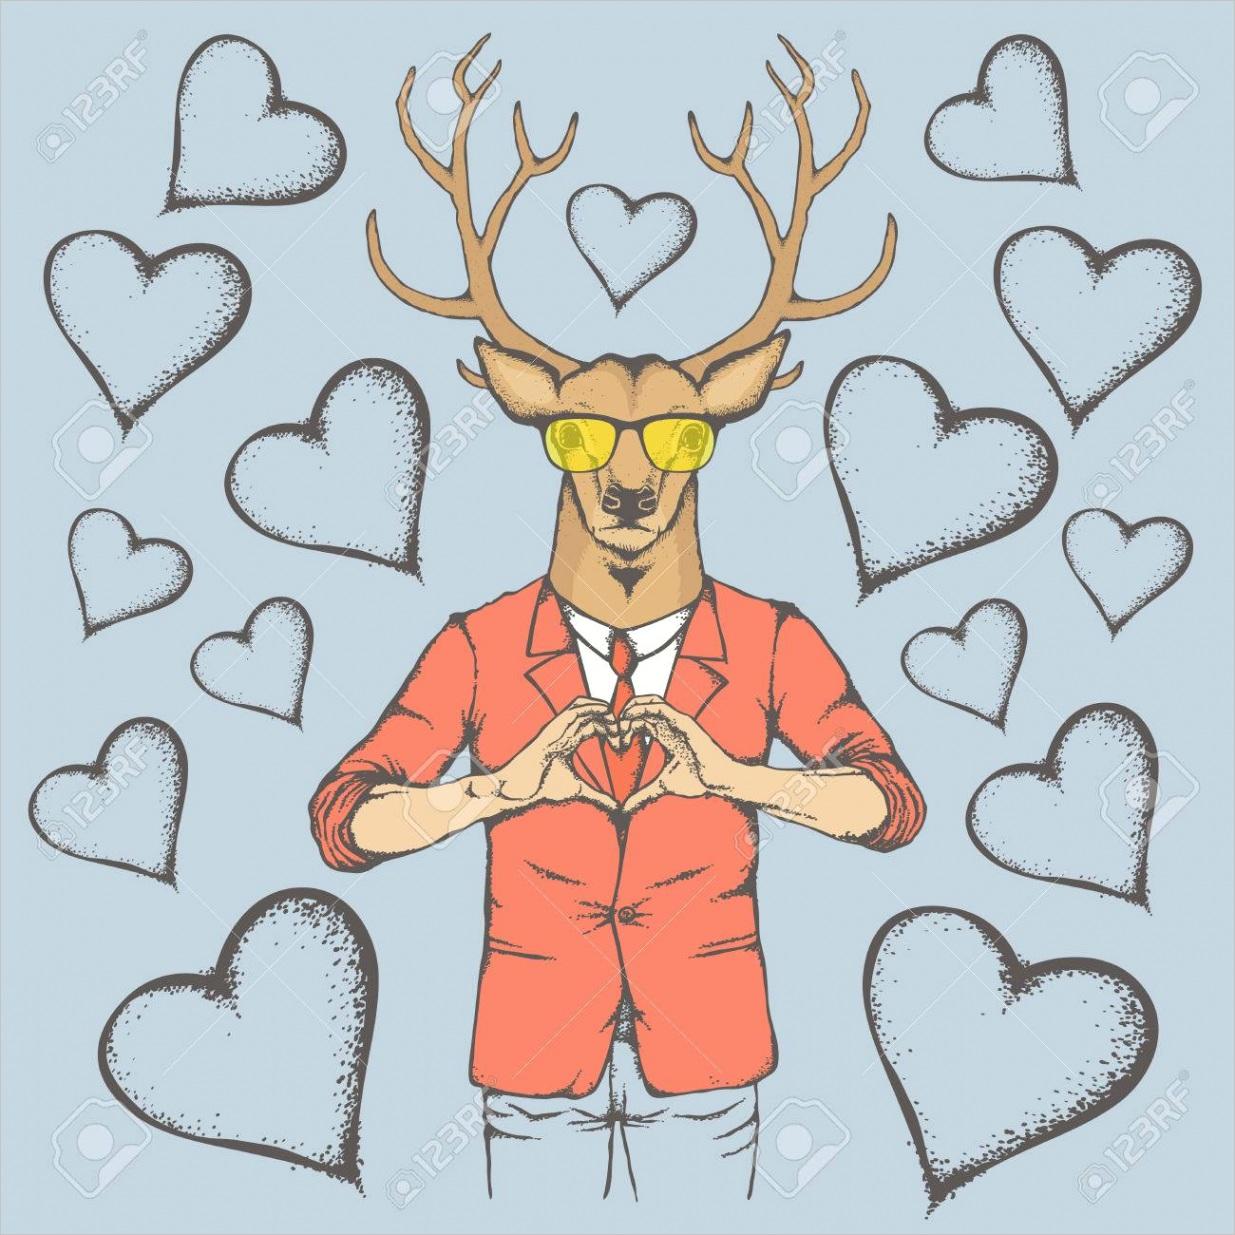 photo deer valentine day vector concept illustration of deer head on human body rein deer showing heart sh